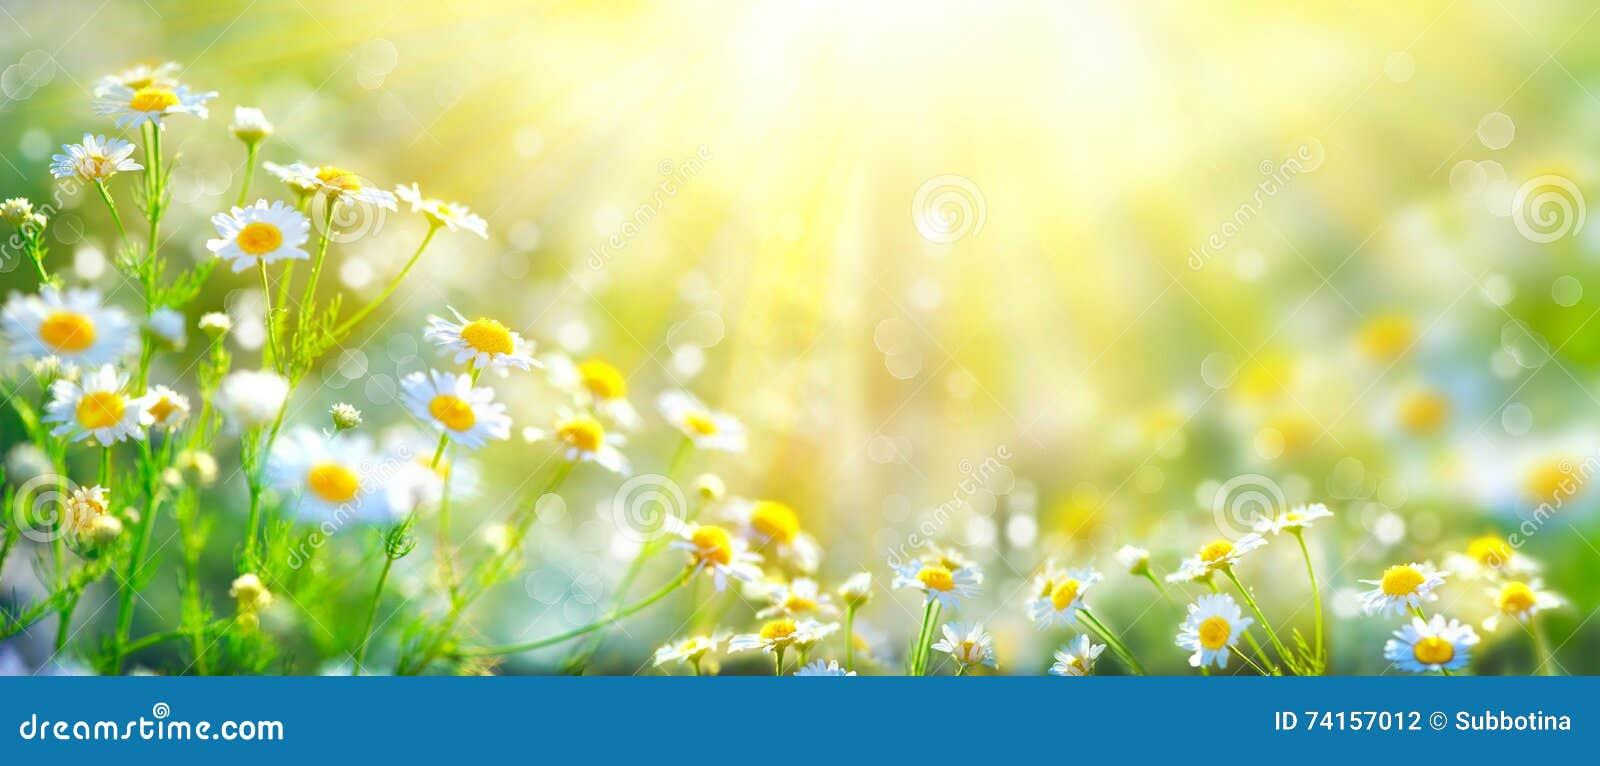 Beautiful nature scene with blooming chamomiles